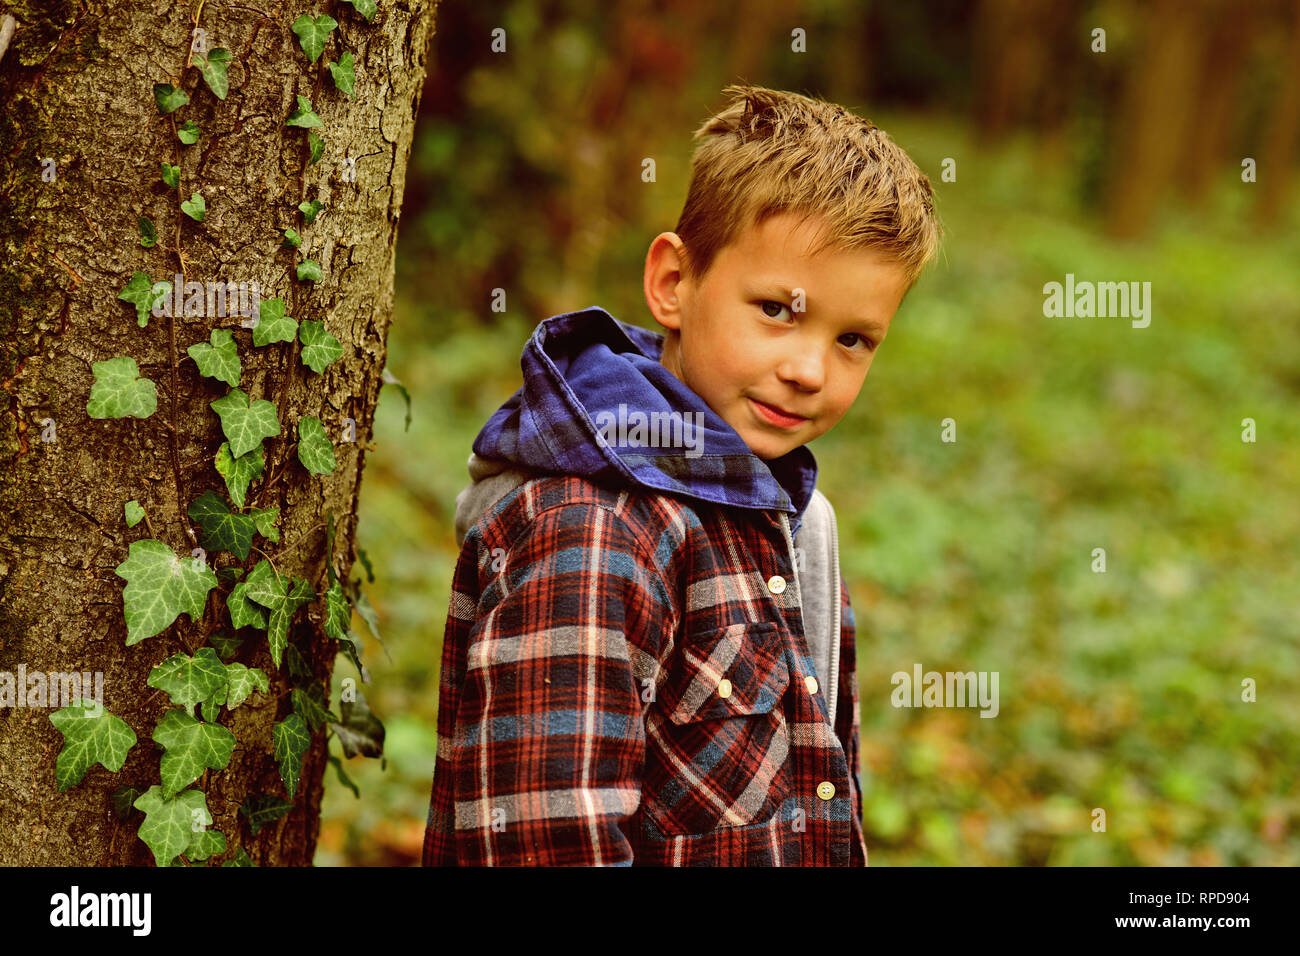 Every single childhood matters. Small boy enjoy childhood years. Small boy play in forest. Childhood is a short season - Stock Image